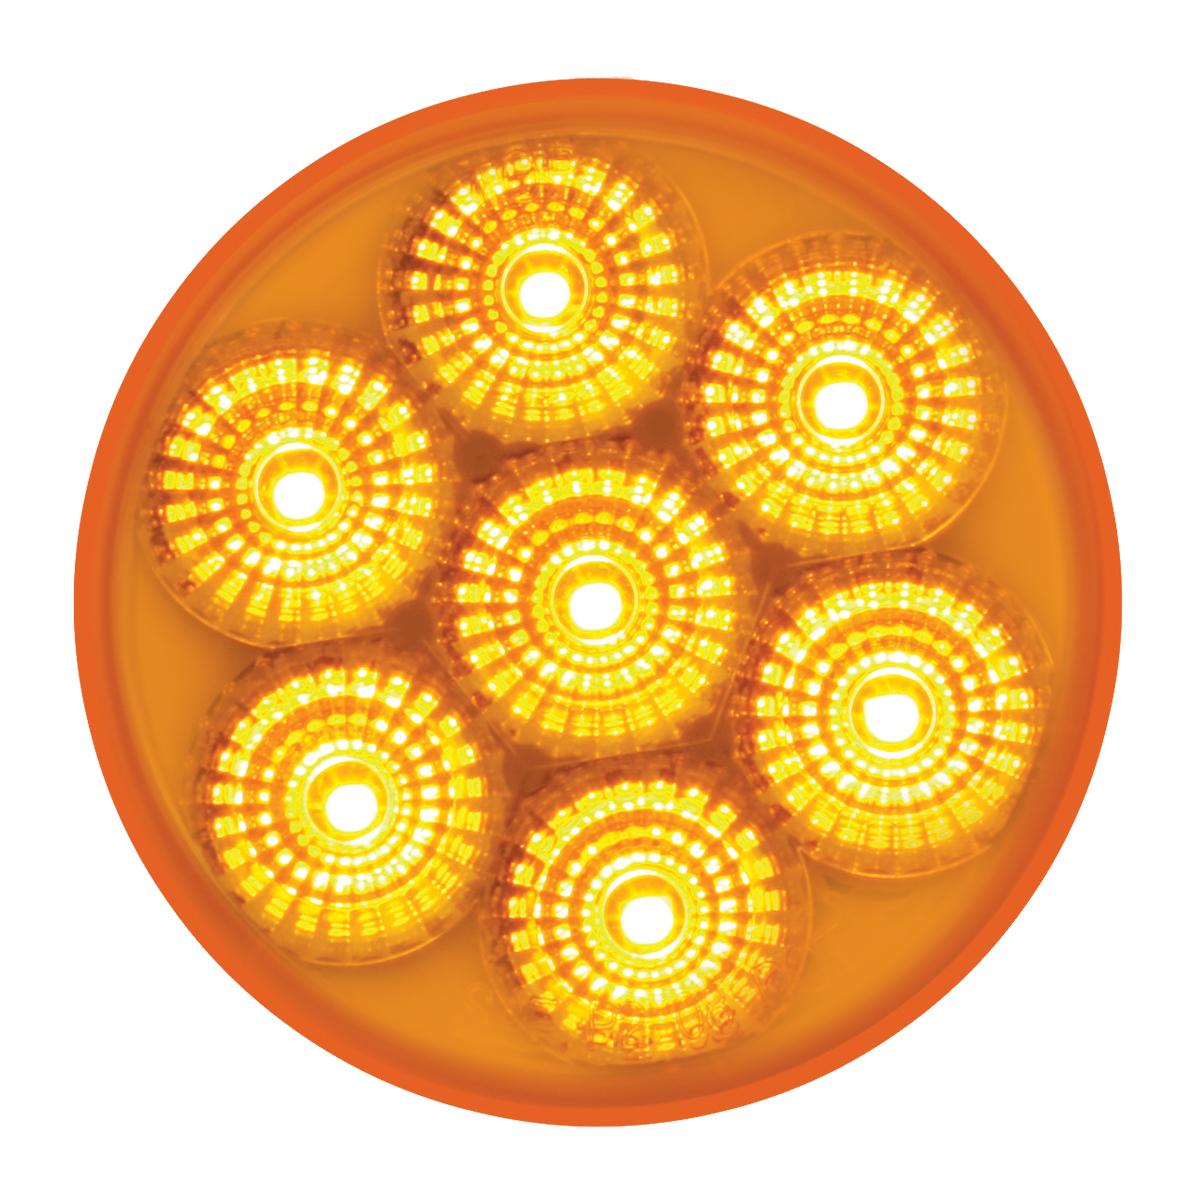 "76660 2-1/2"" Spyder LED Marker Light"